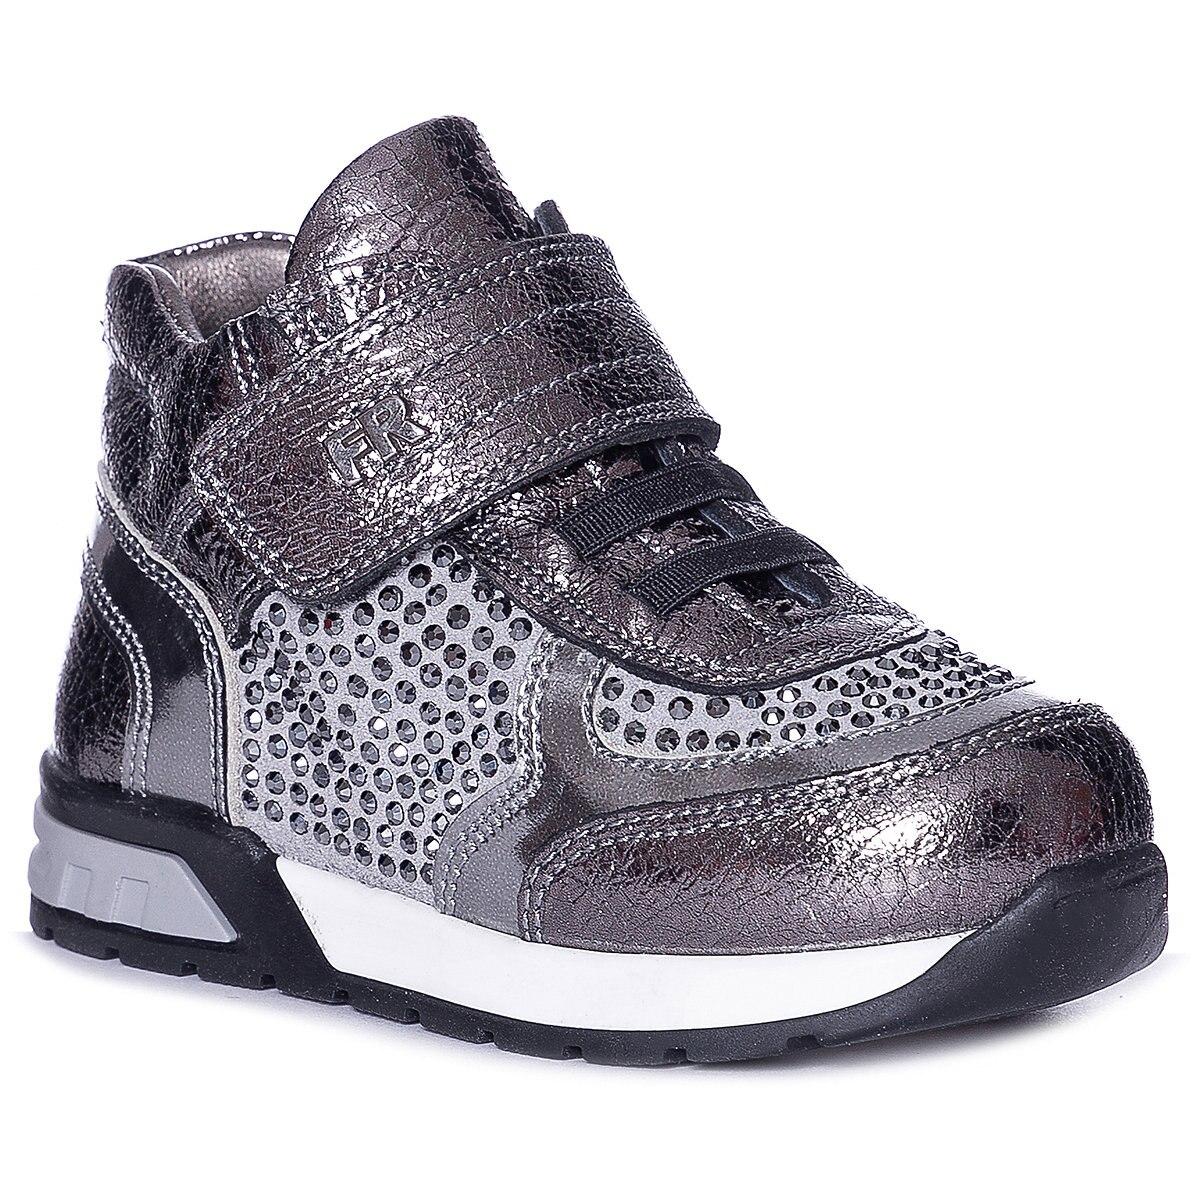 TIFLANI Kids' Sneakers 10924821 shoes baby children footwear sport gray Girls Spring/Autumn tiebao professional tf turf rubber soles outdoor children kids football shoes teenager training shoe sneakers